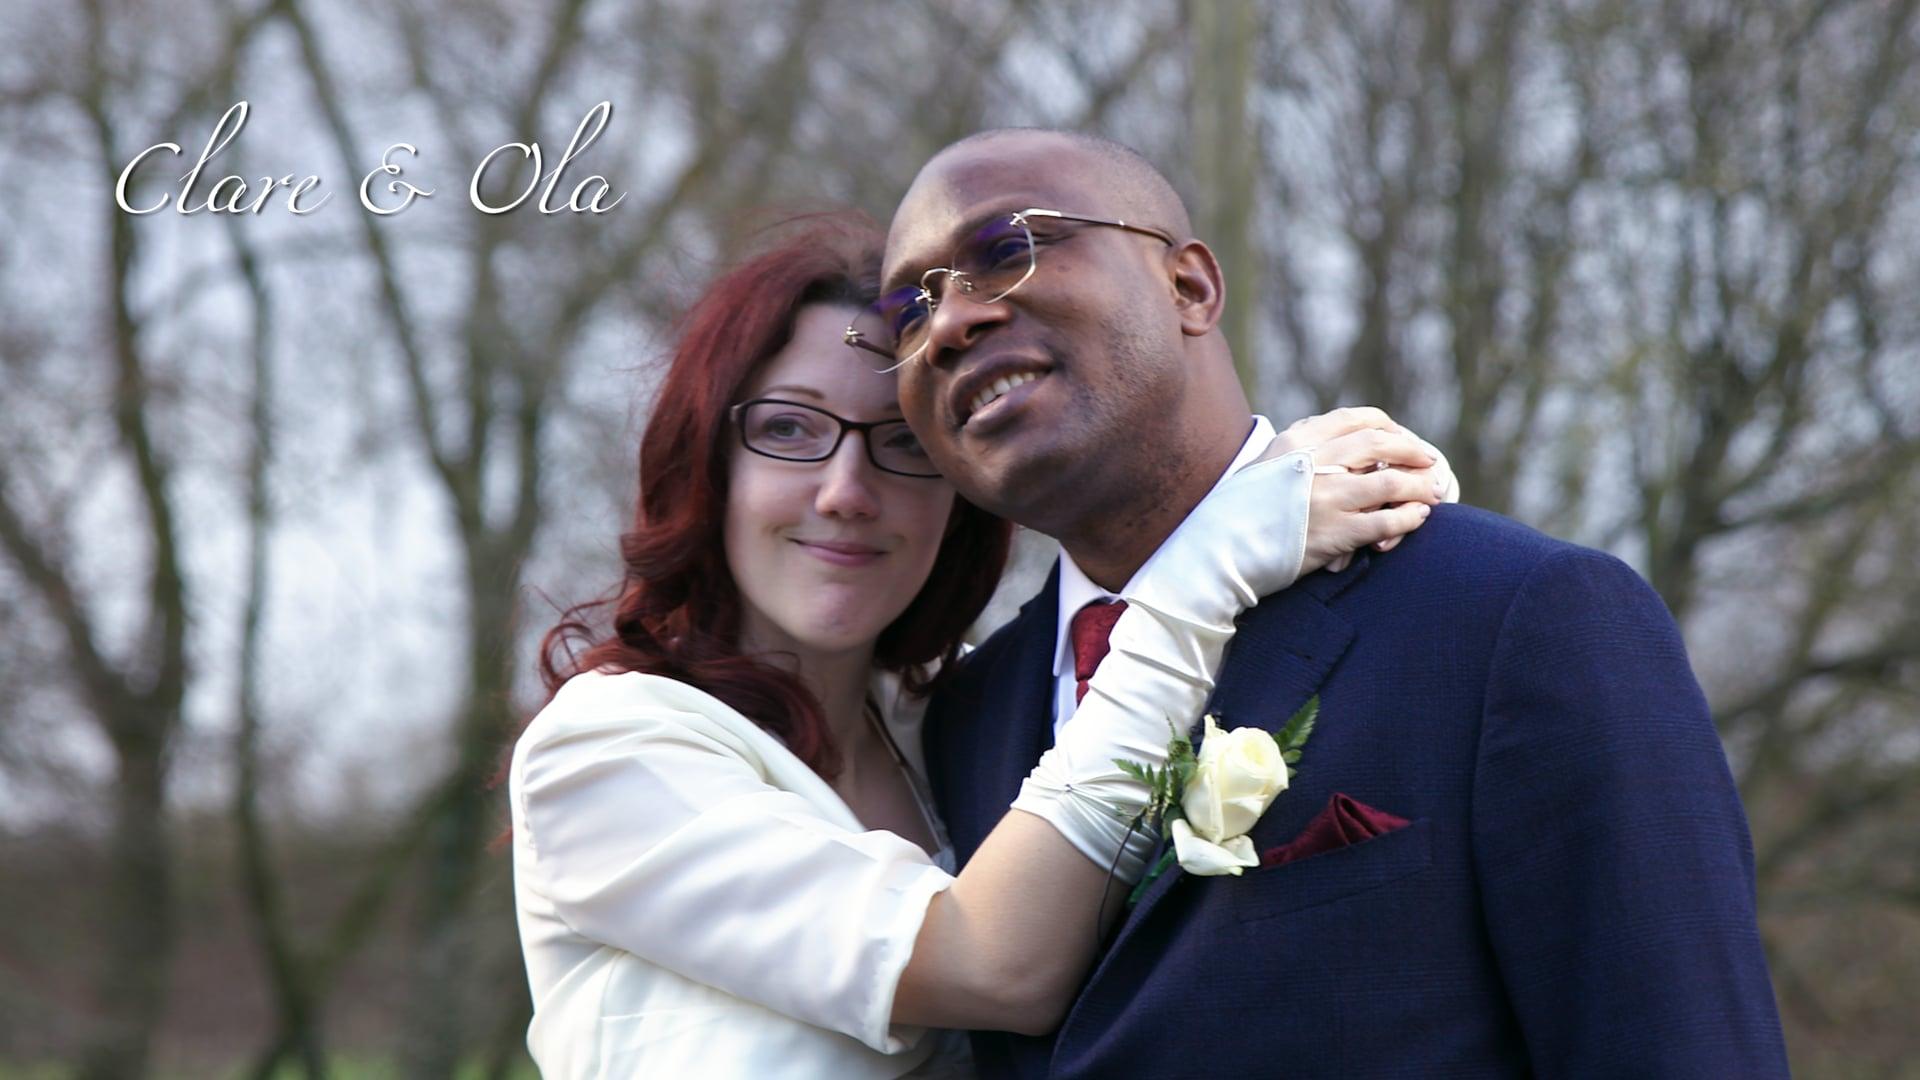 Clare & Ola - Wedding Highlights (Event)